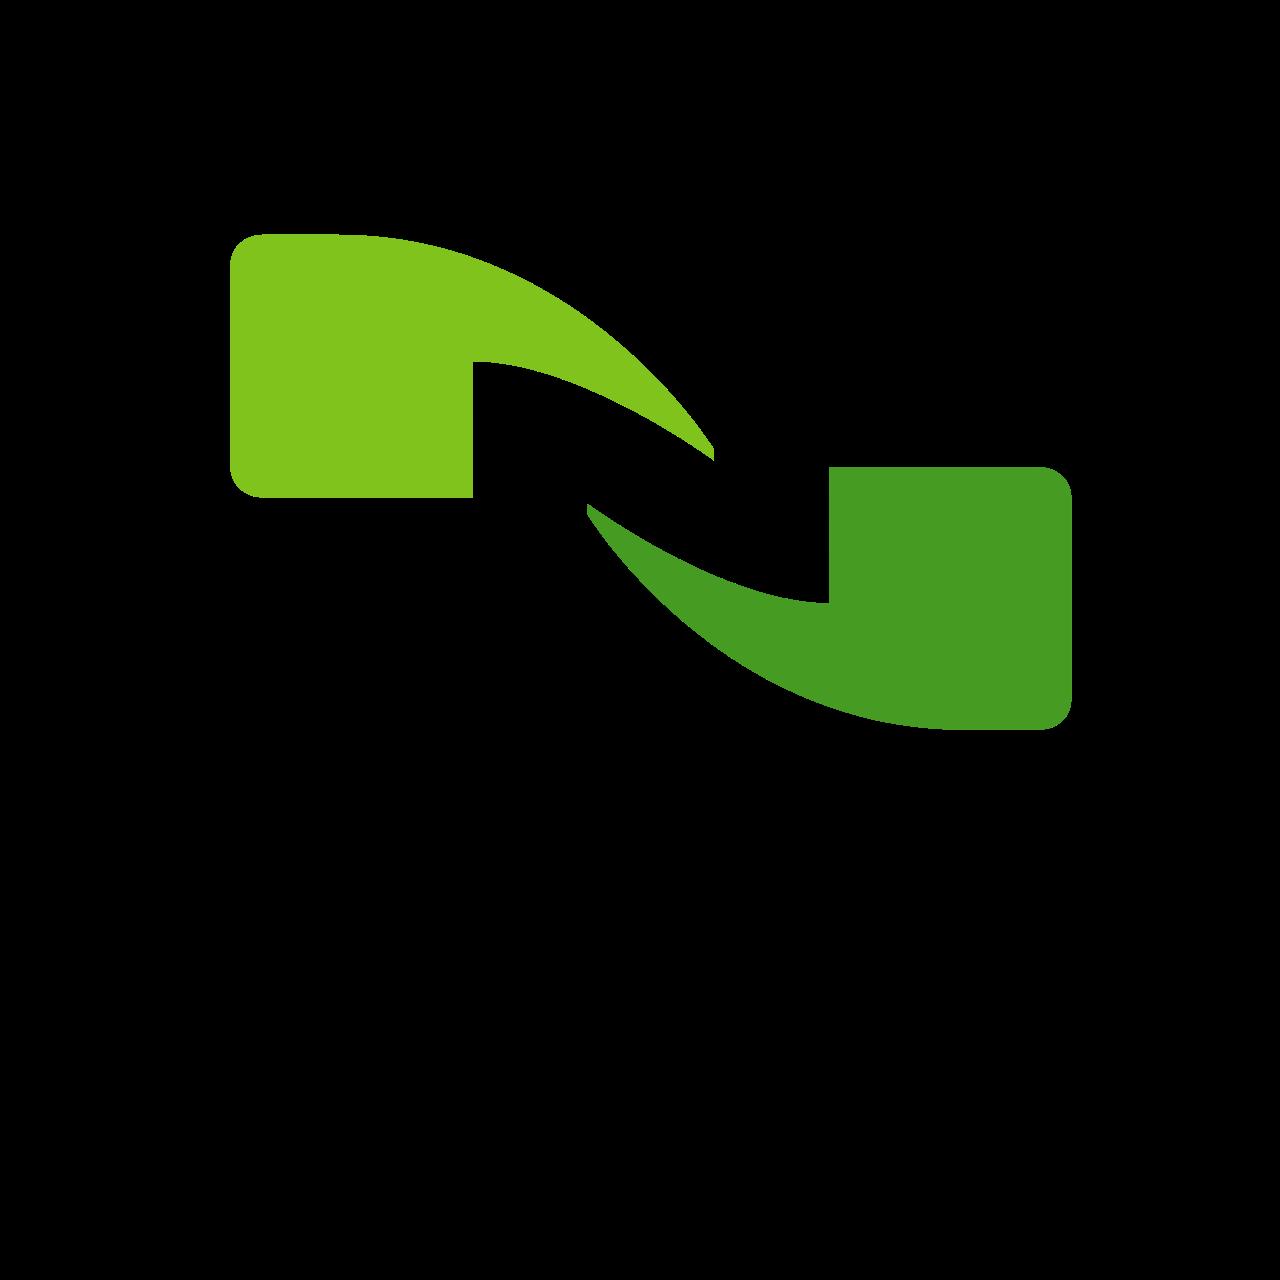 Aktie Nuance Communications- Fundamentale Aktienanalyse